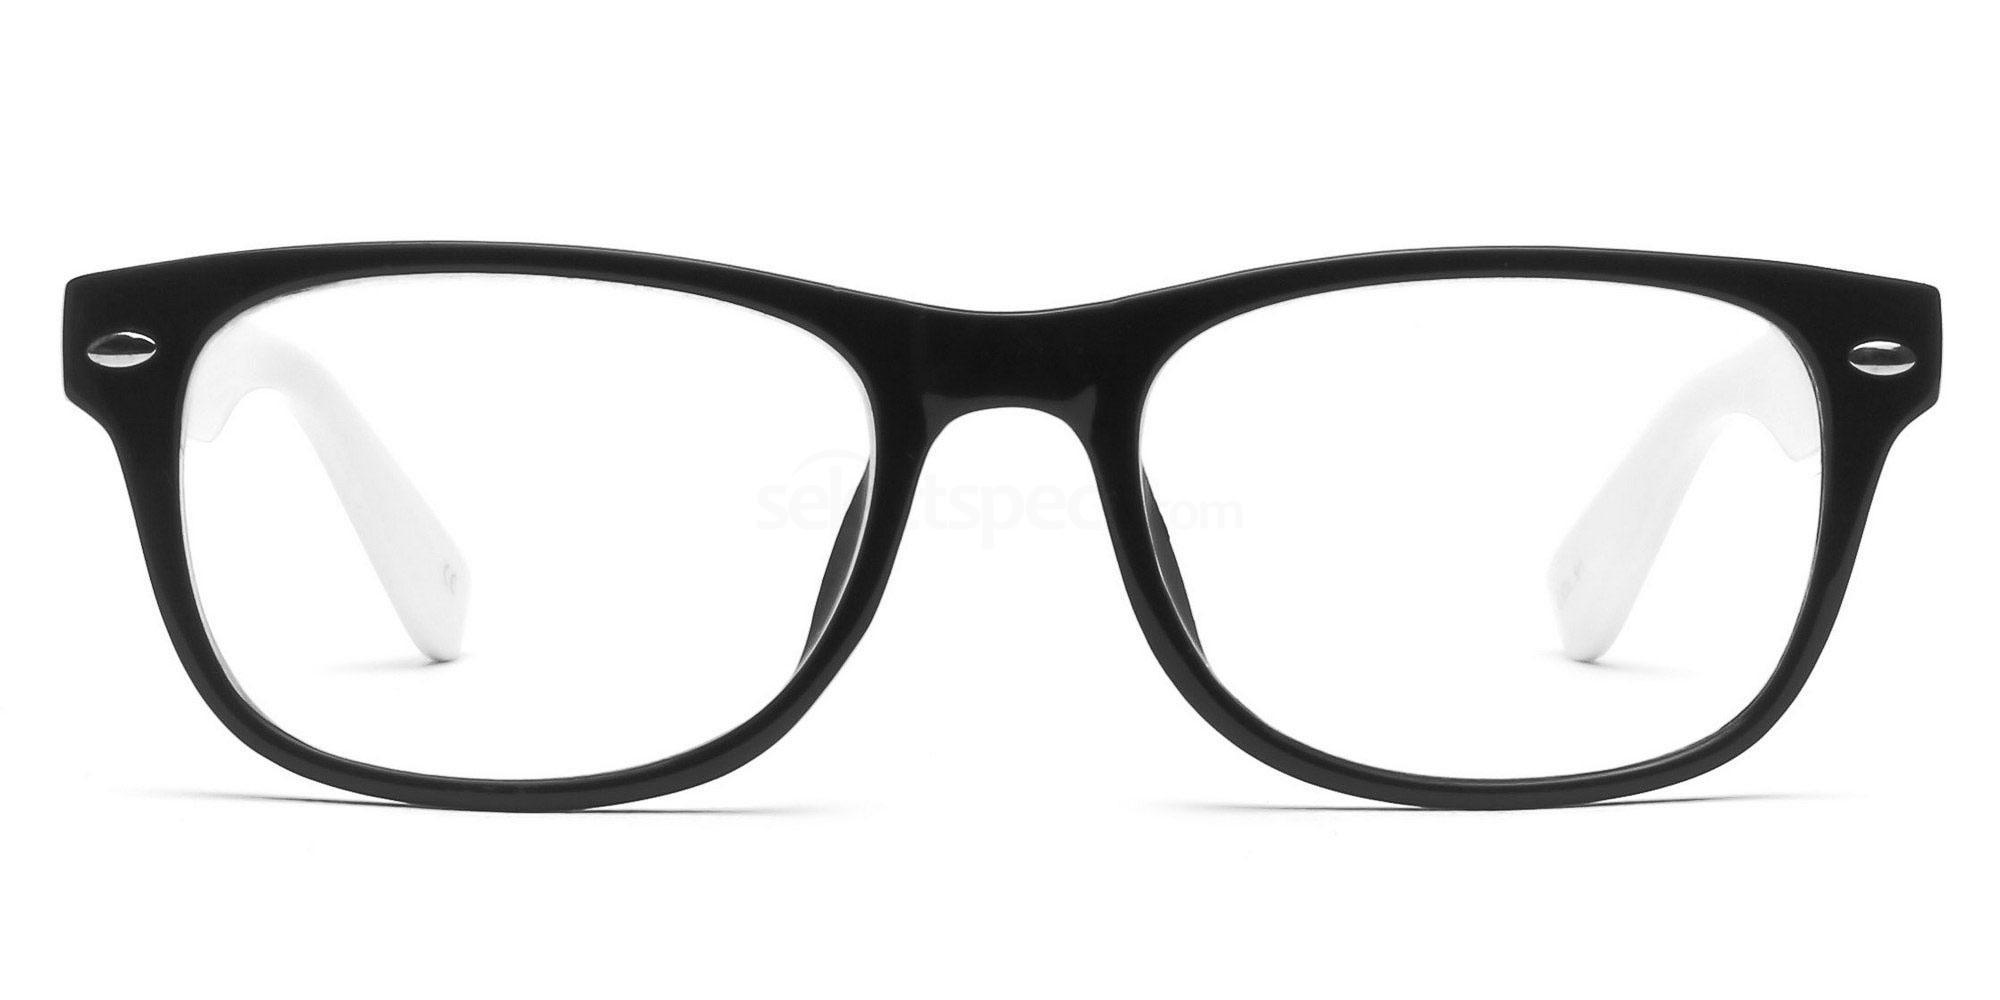 Black and White P2383 - Black and White Glasses, SelectSpecs